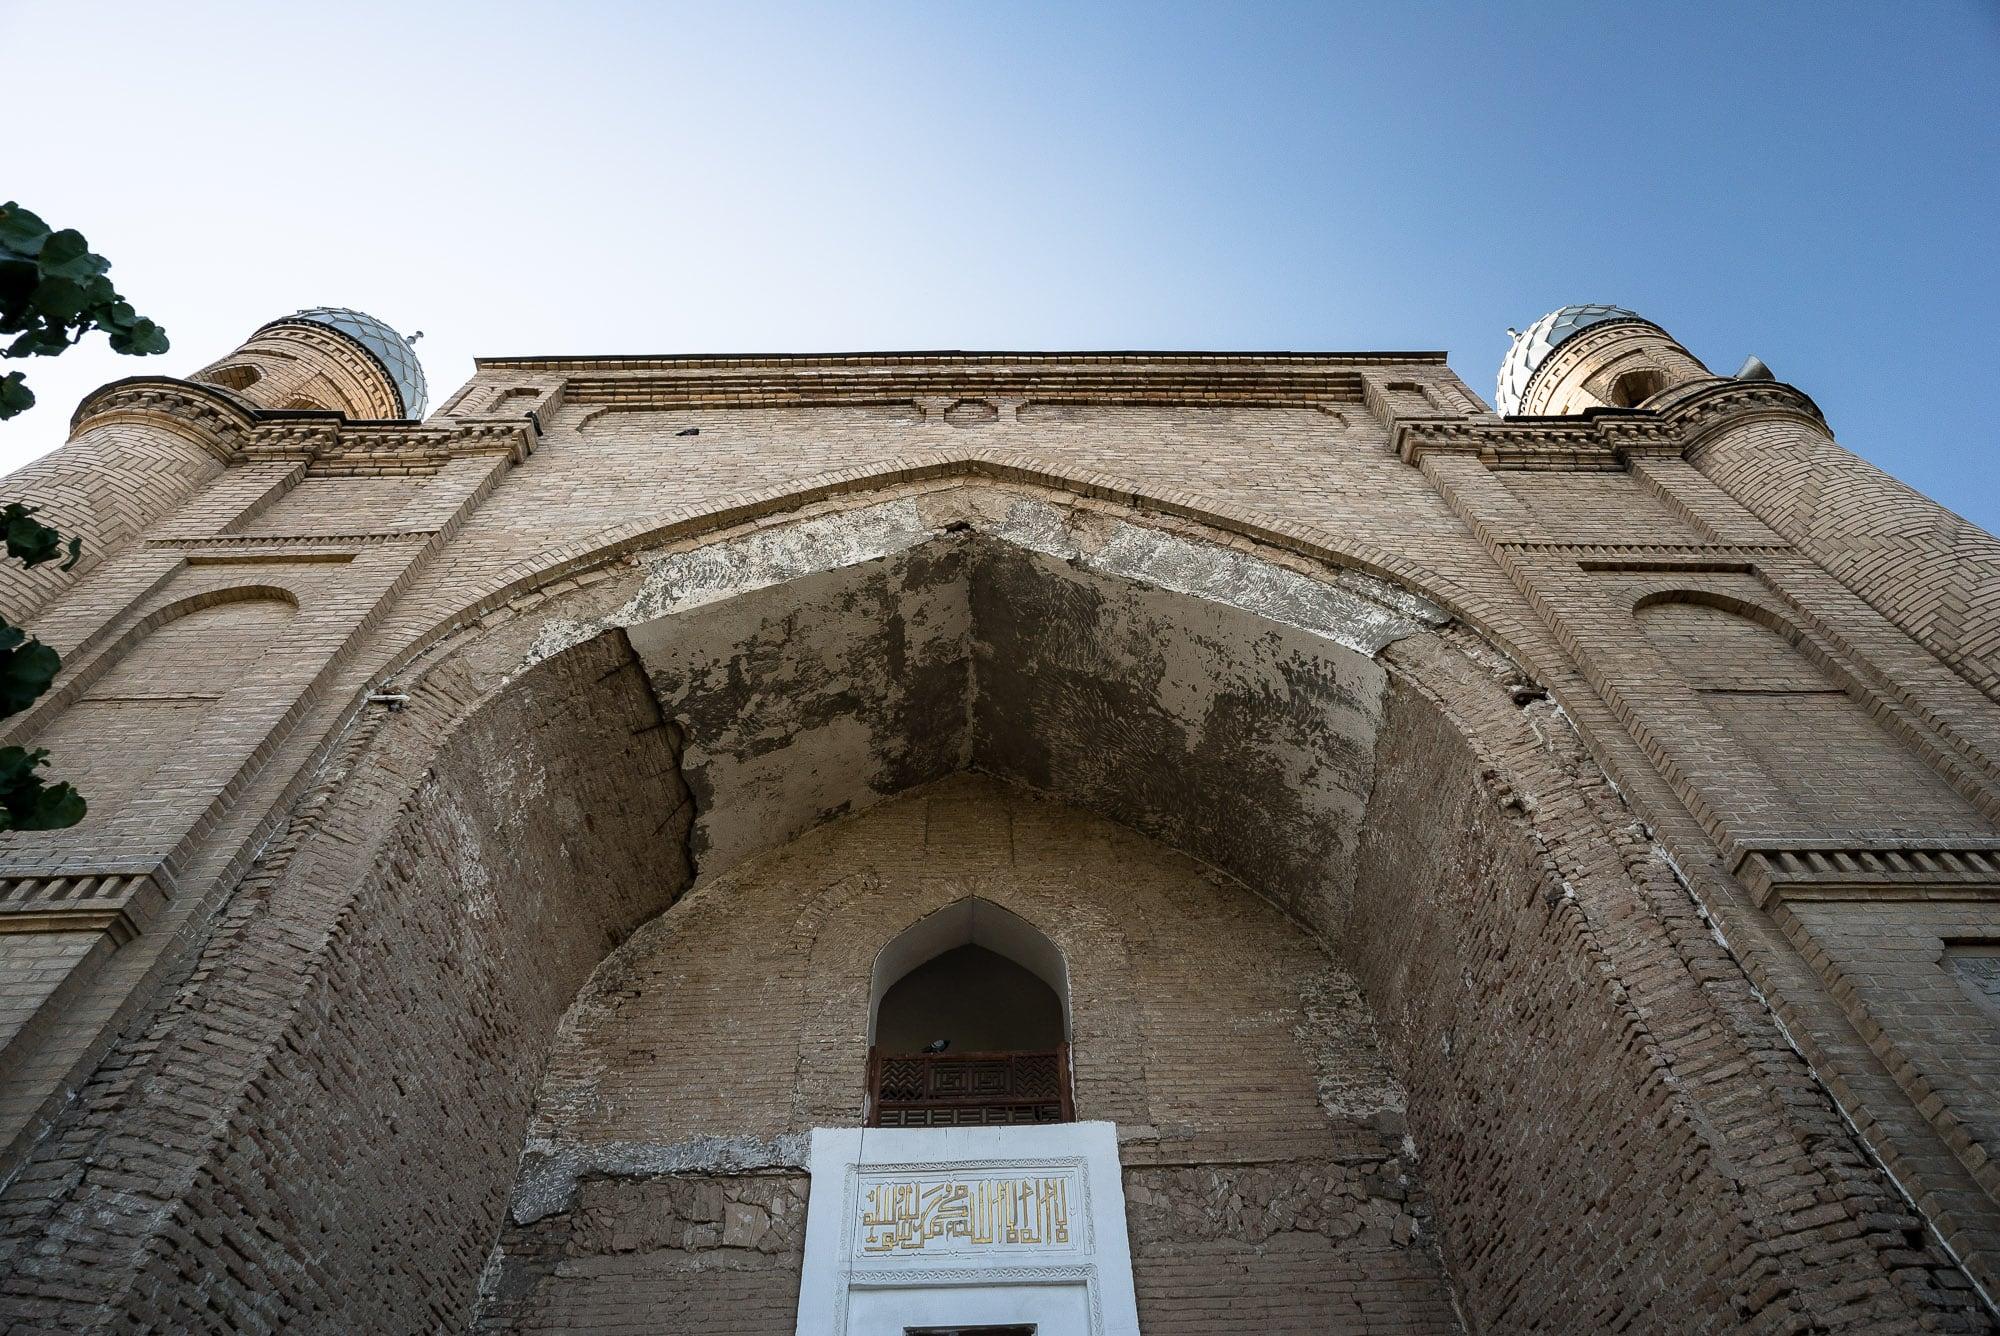 Sheyh Zayniddin's mausoleum